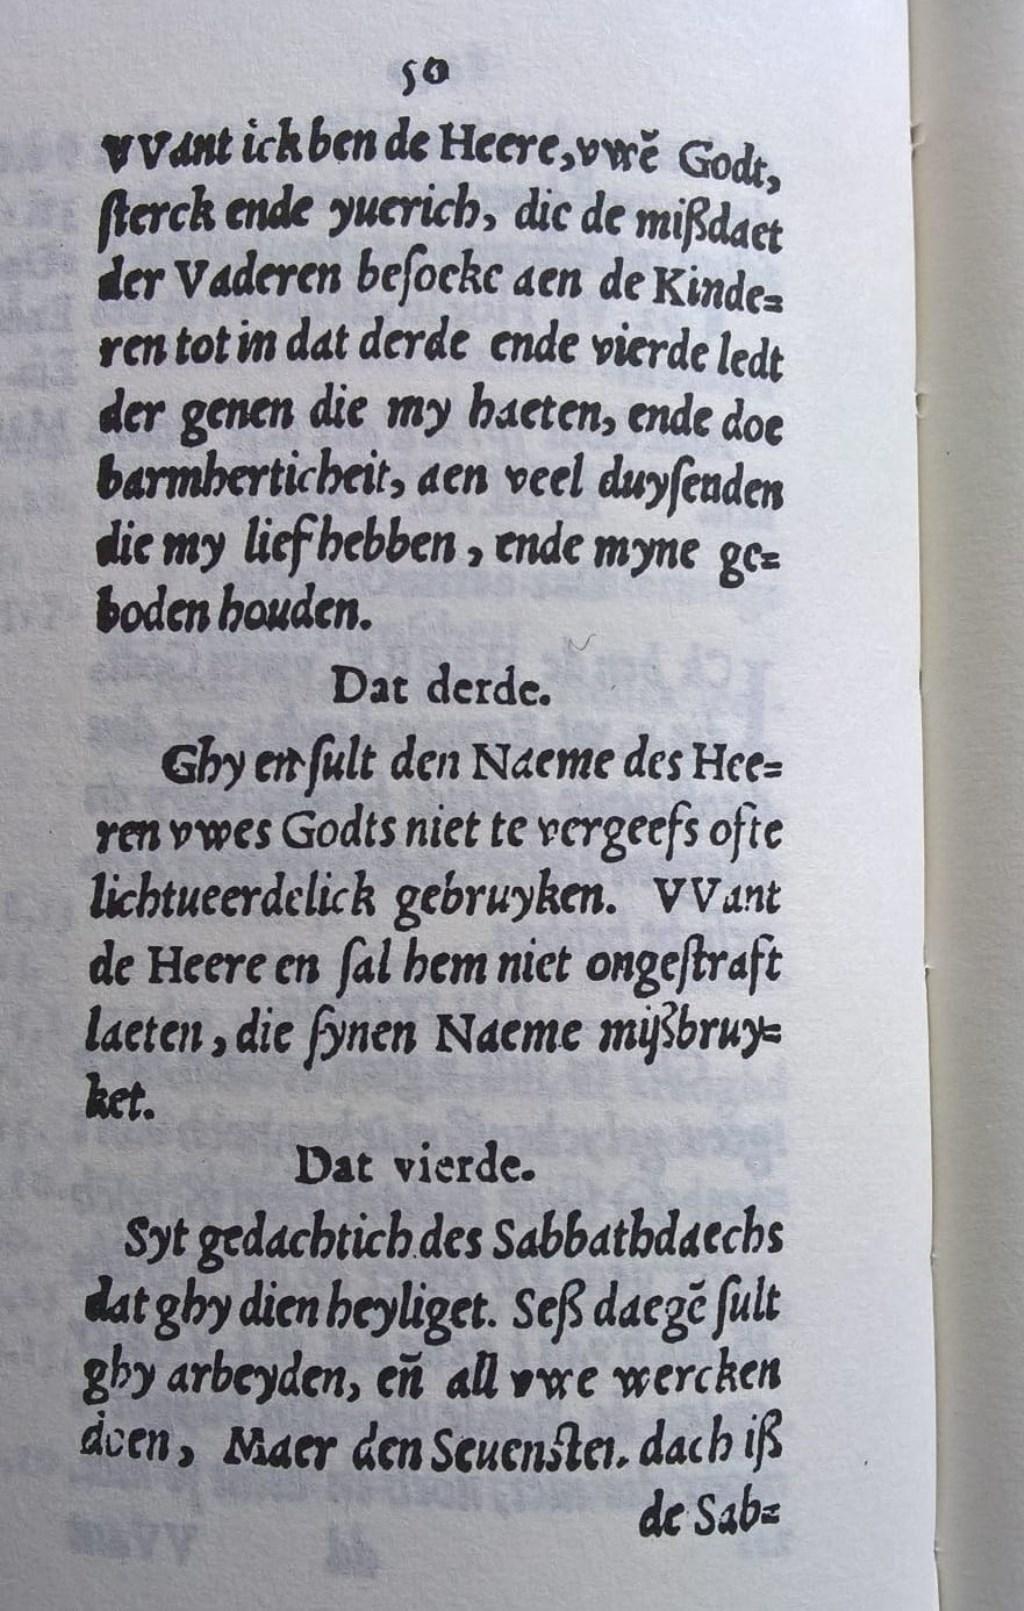 De bron waaruit de tekst afkomstig is Louis Wüllschleger © BDU media